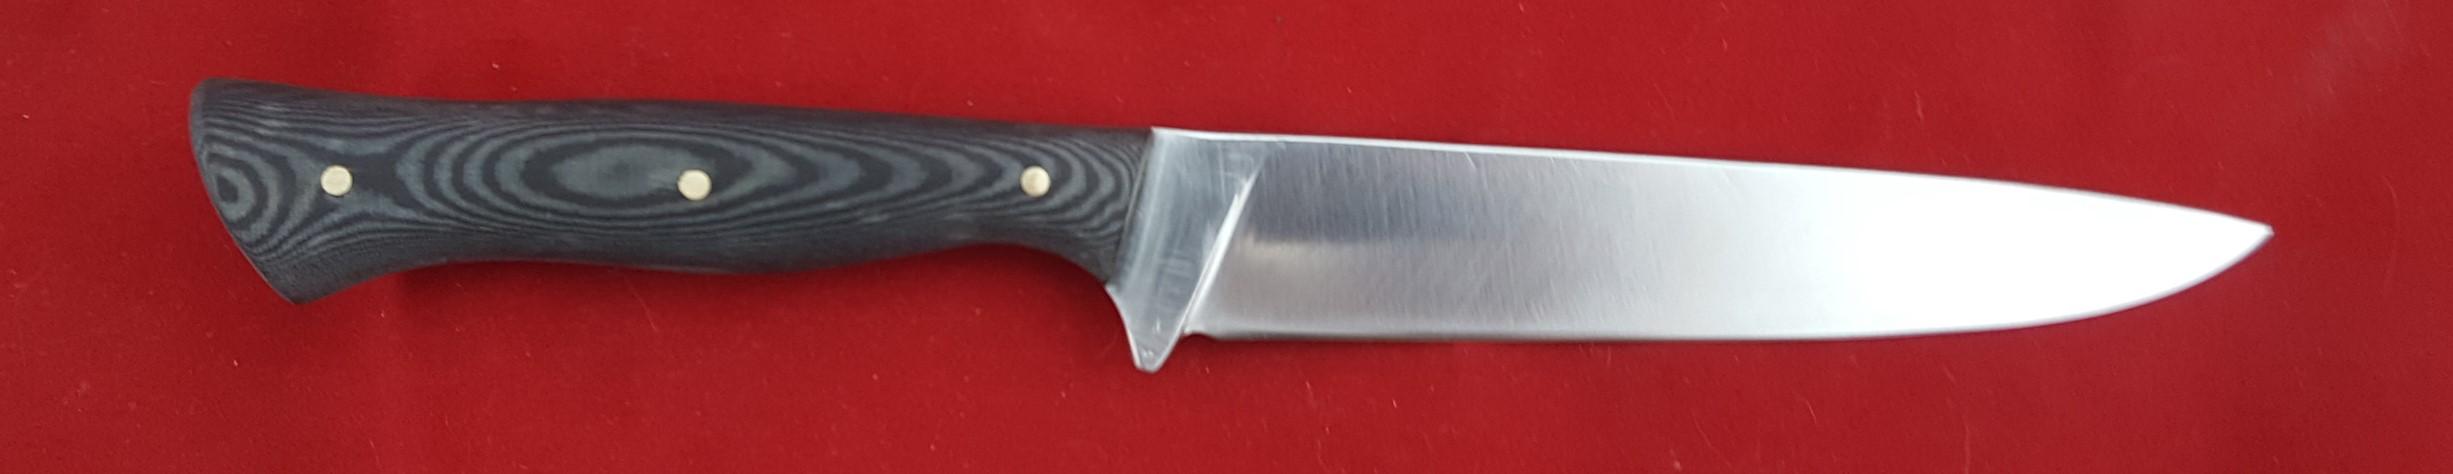 Hardcore hunter 260 mm OL 1084 blade Canvas Micarta Handle. Made to order